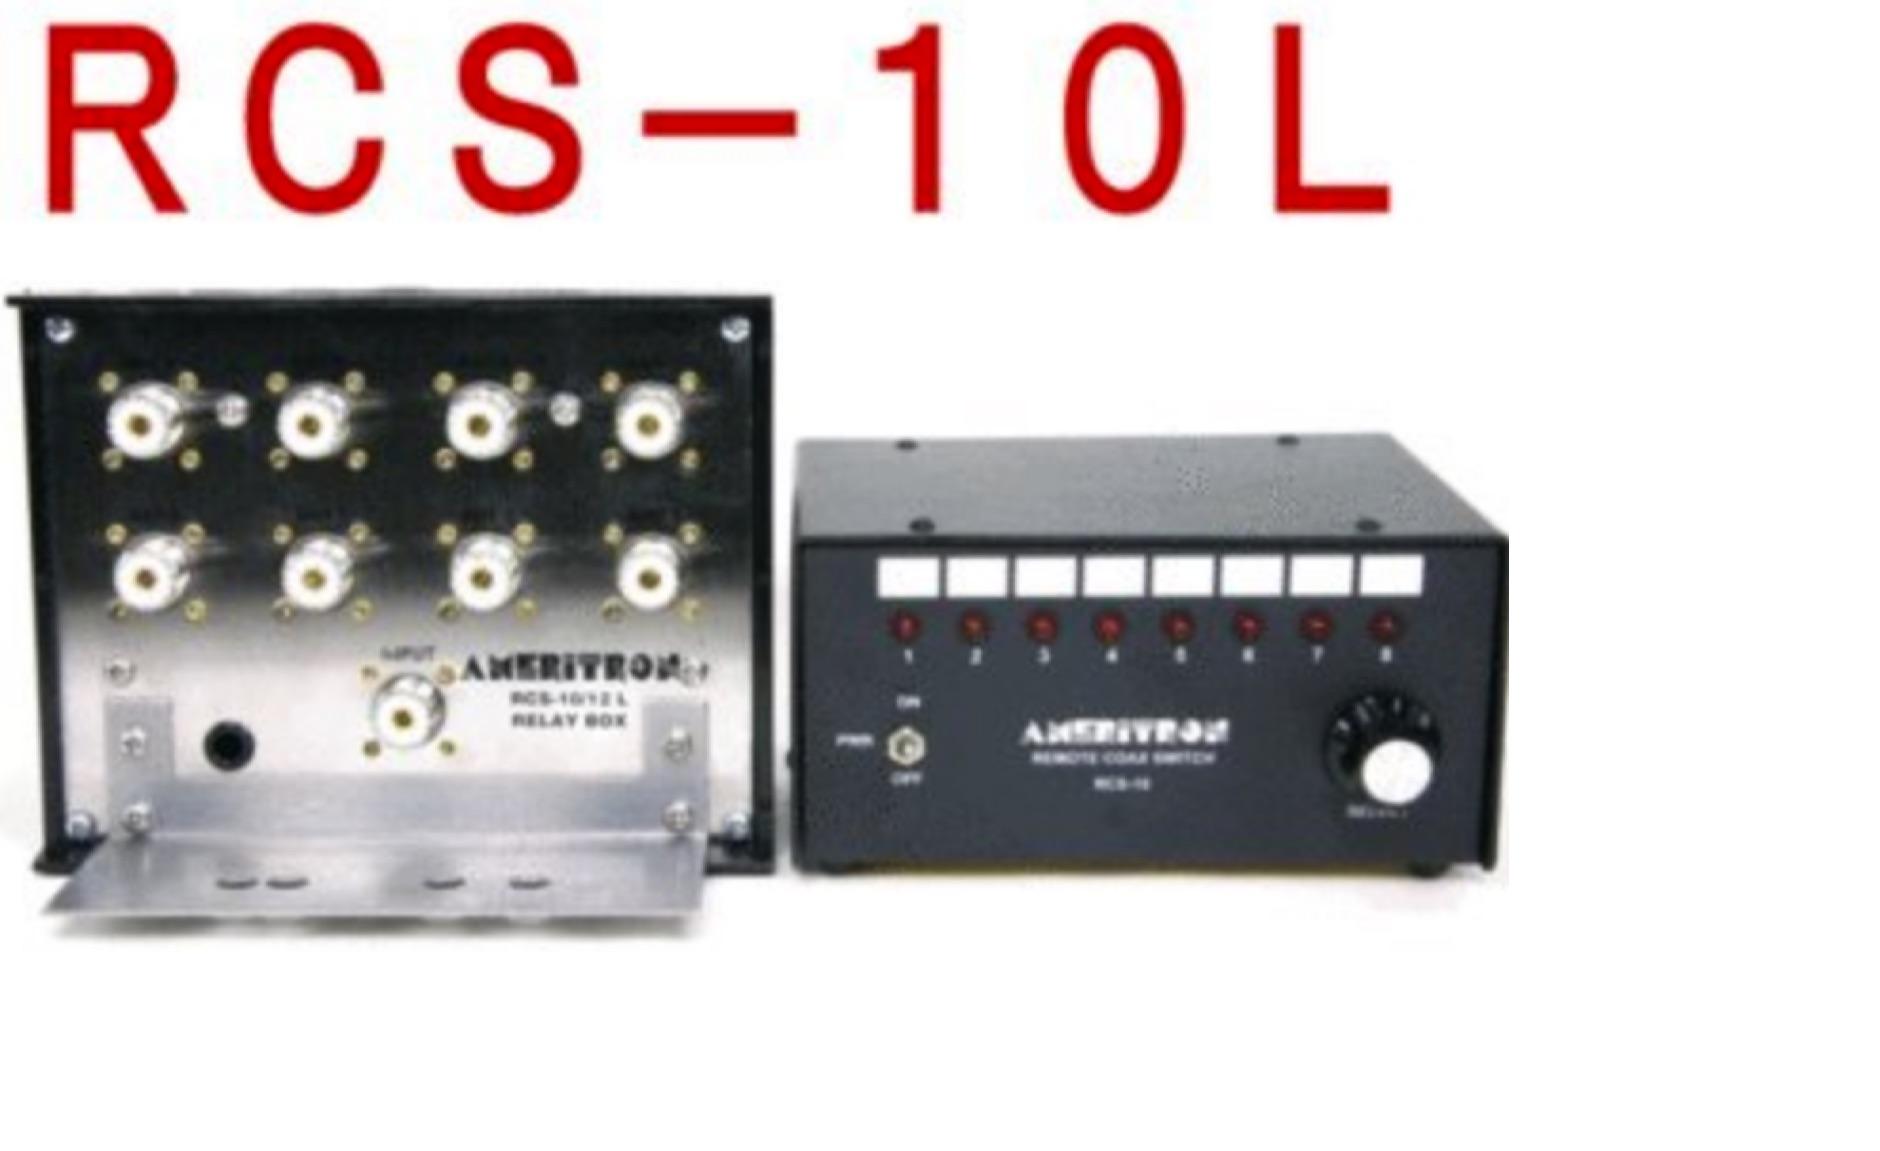 Ameritron RCS-10 Review